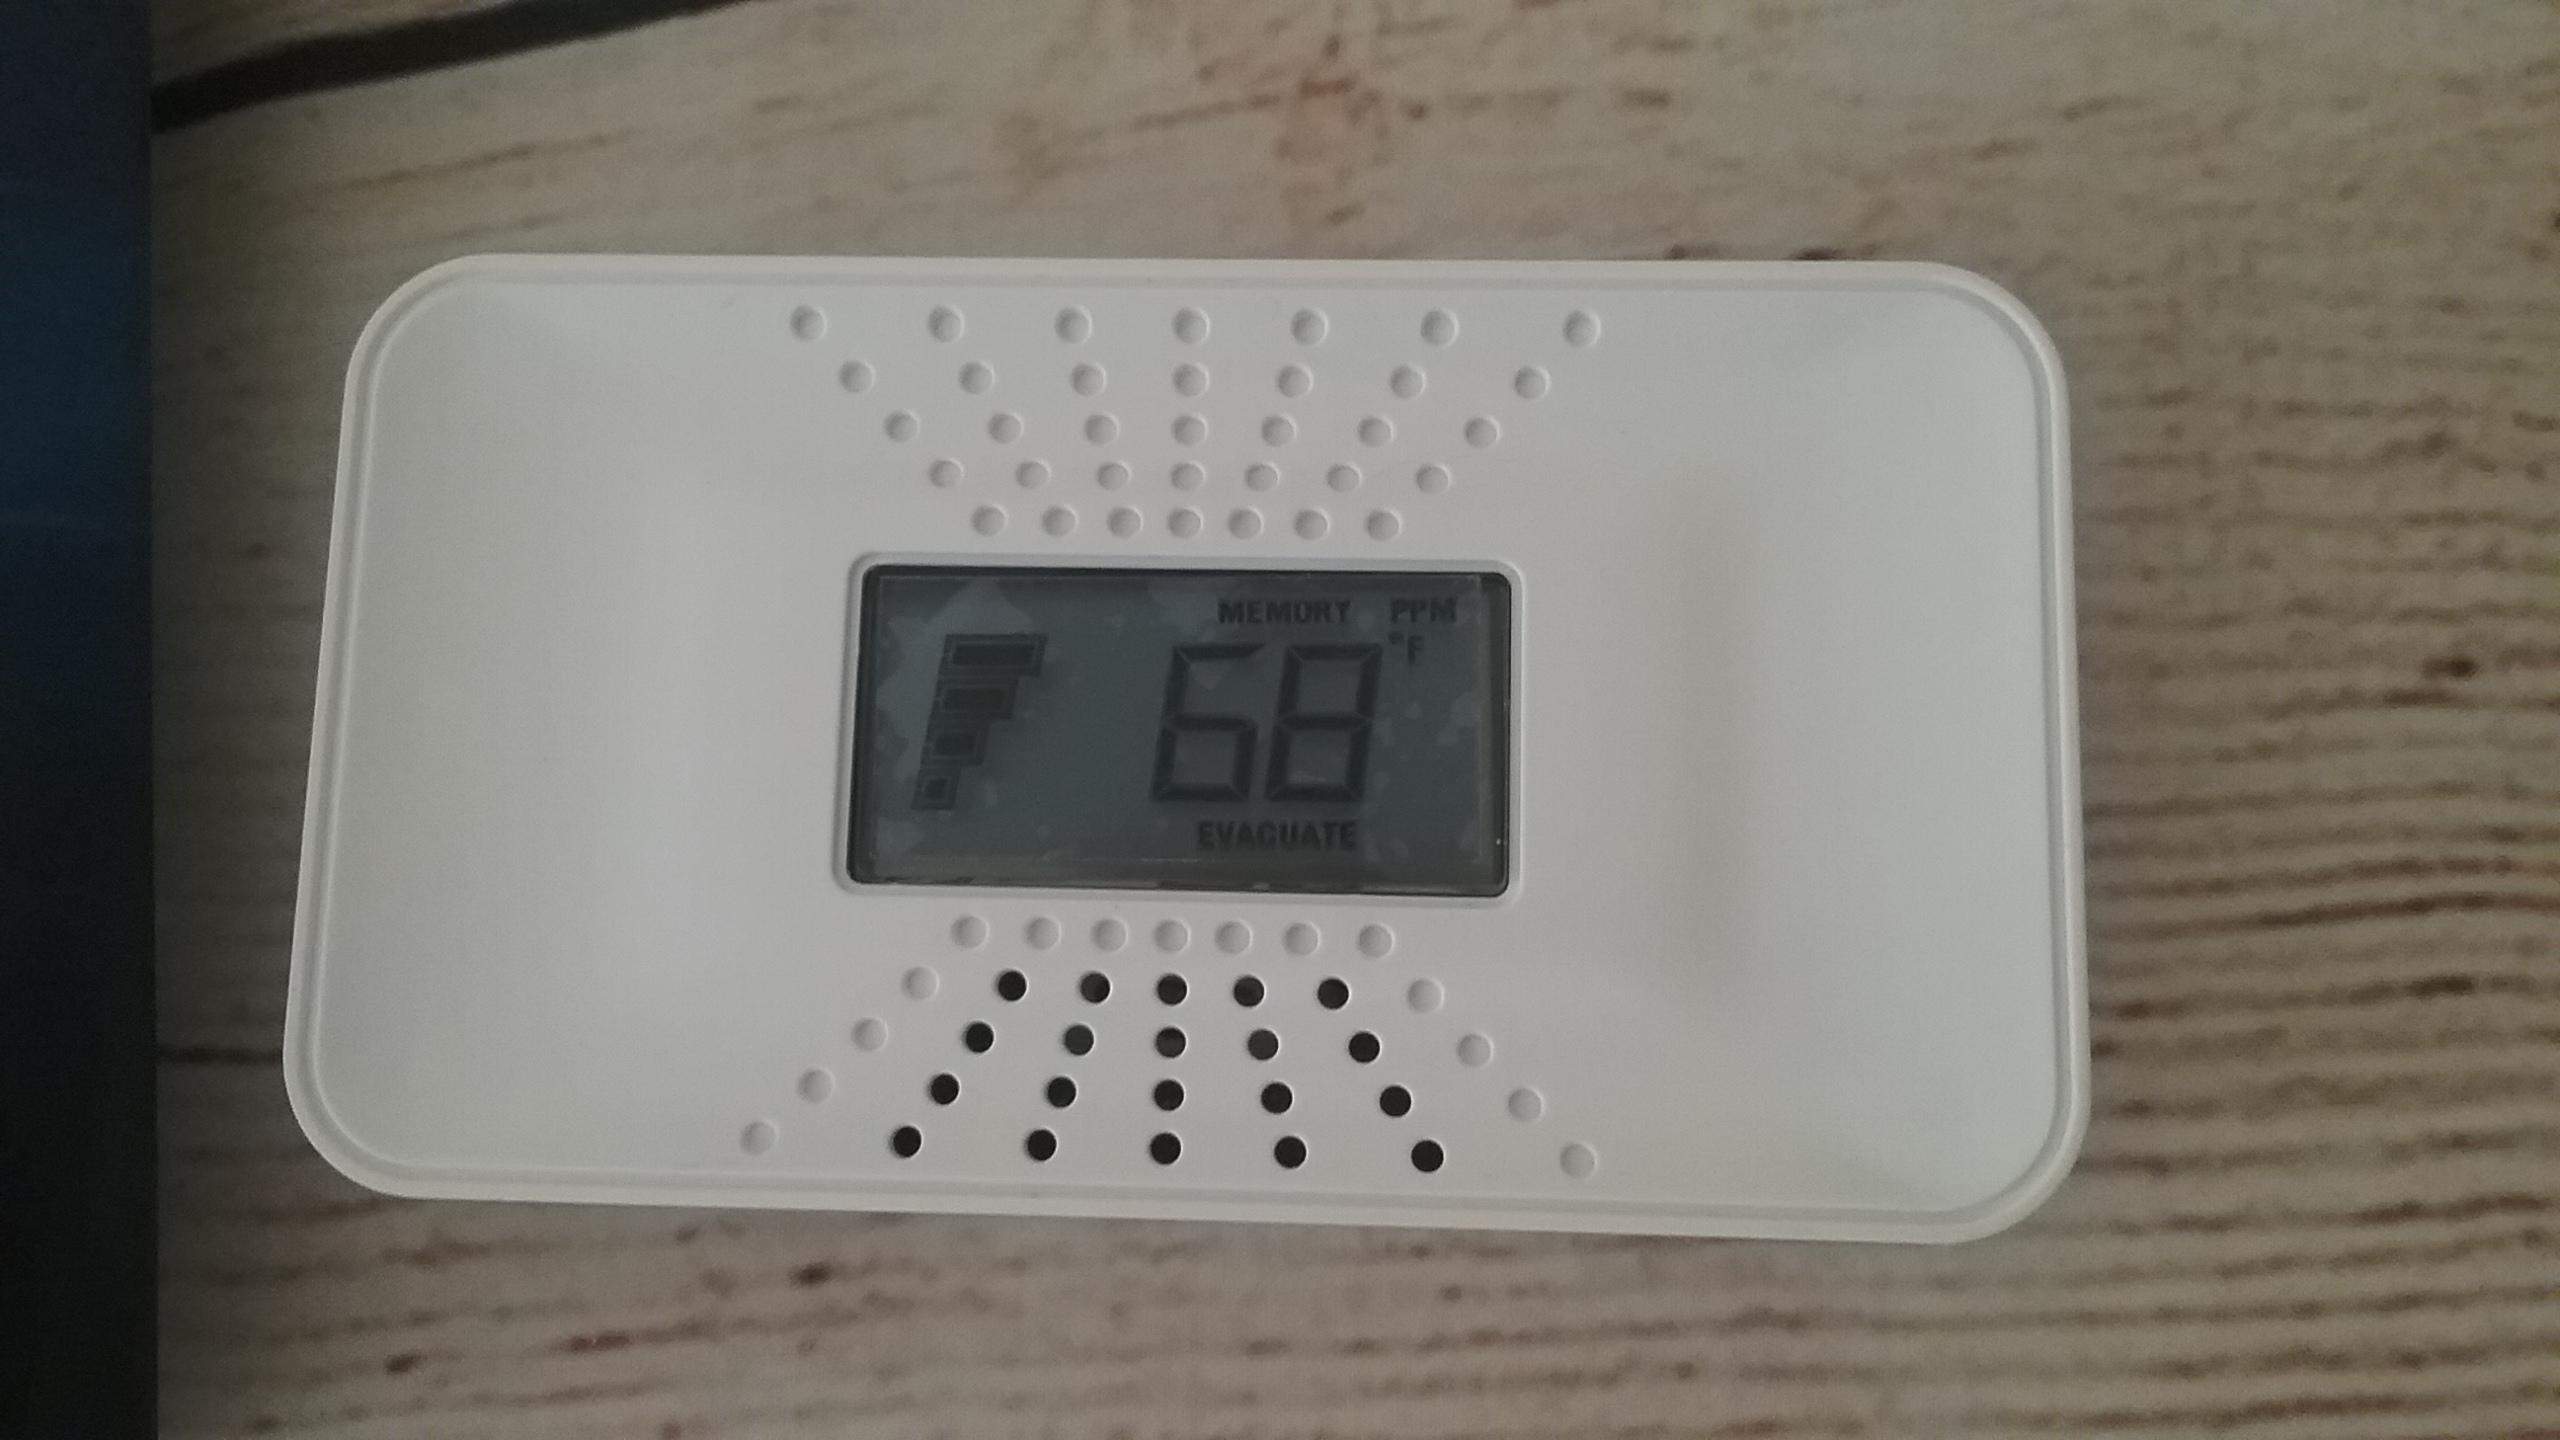 First Alert Carbon Monoxide Detector, keeping your family safe!